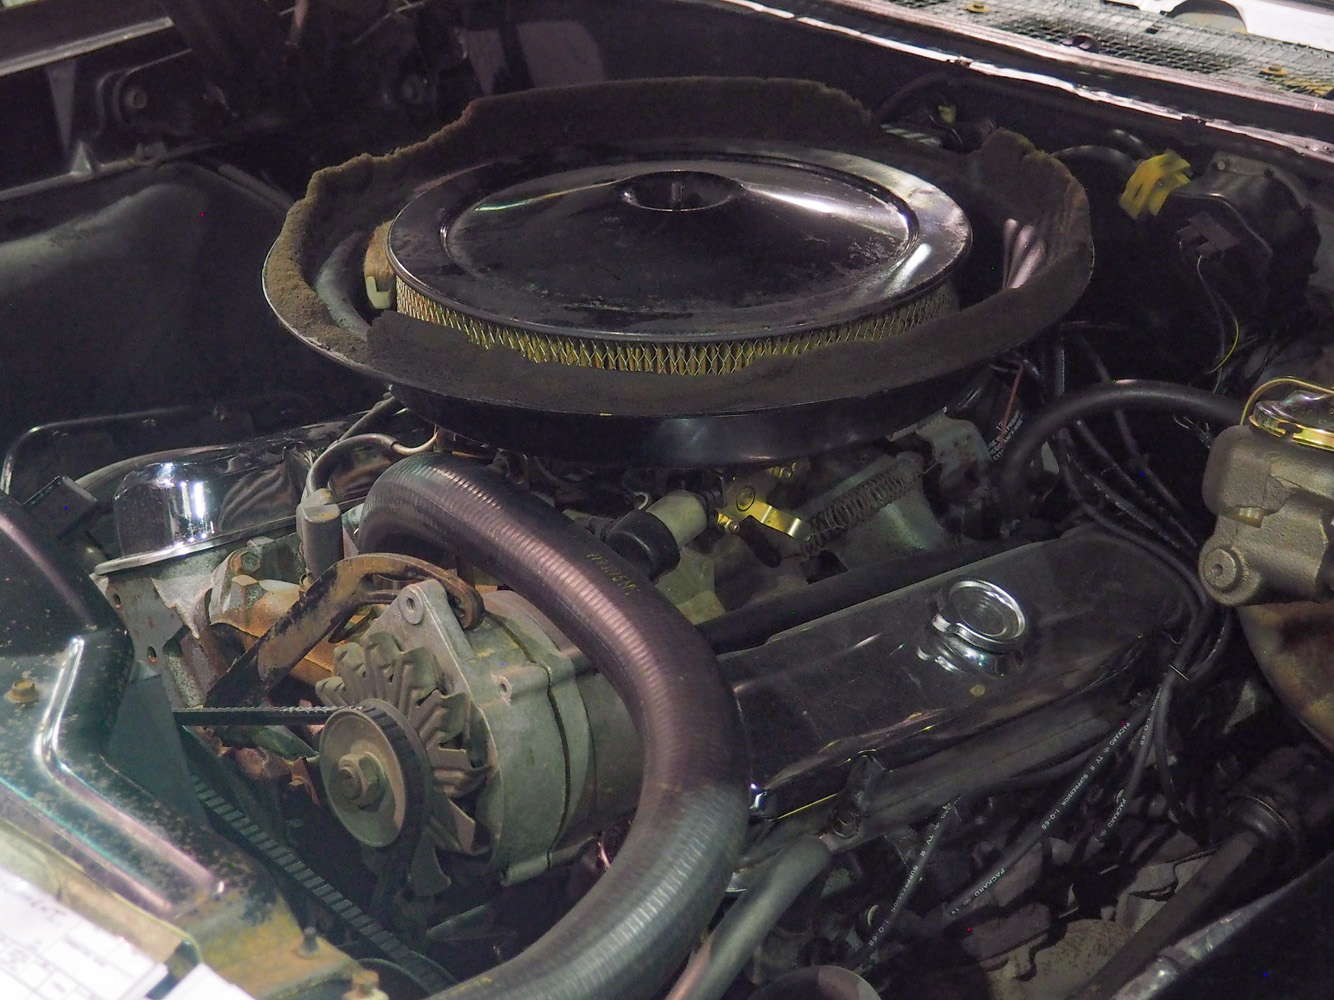 1968 Pontiac Ram Air GTO engine